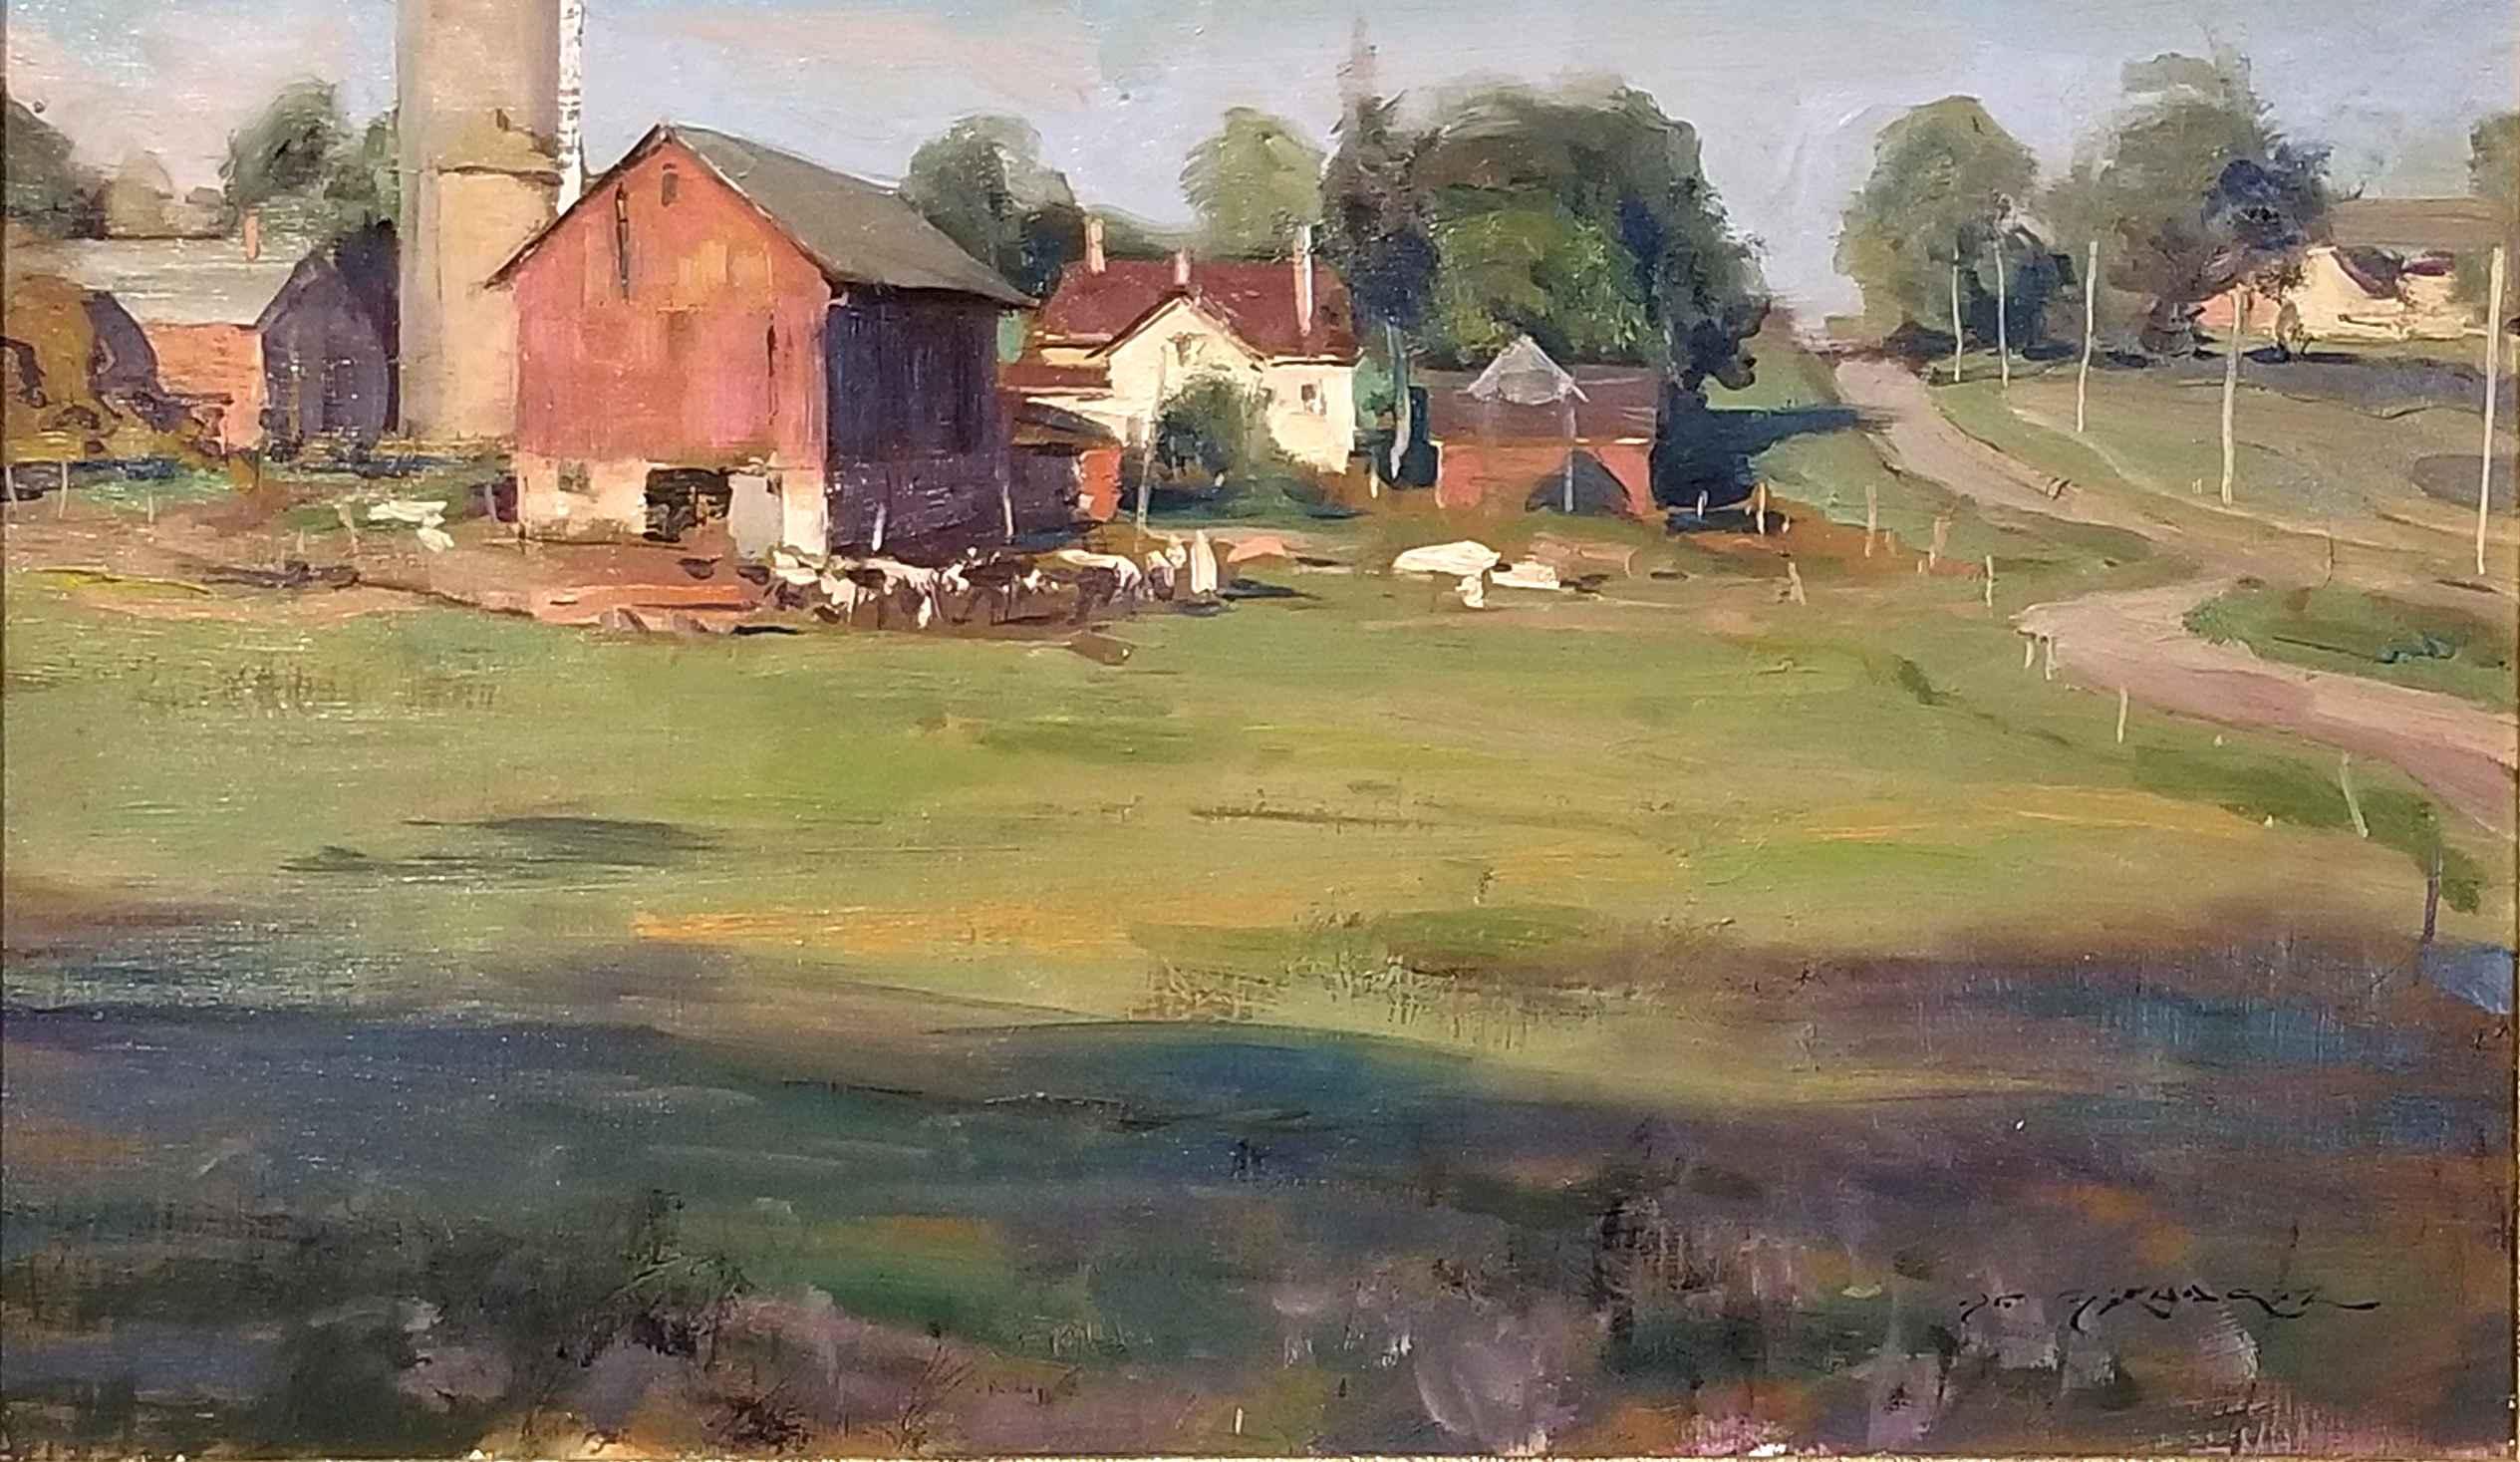 Approaching Shadows by  Daniel Gerhartz - Masterpiece Online